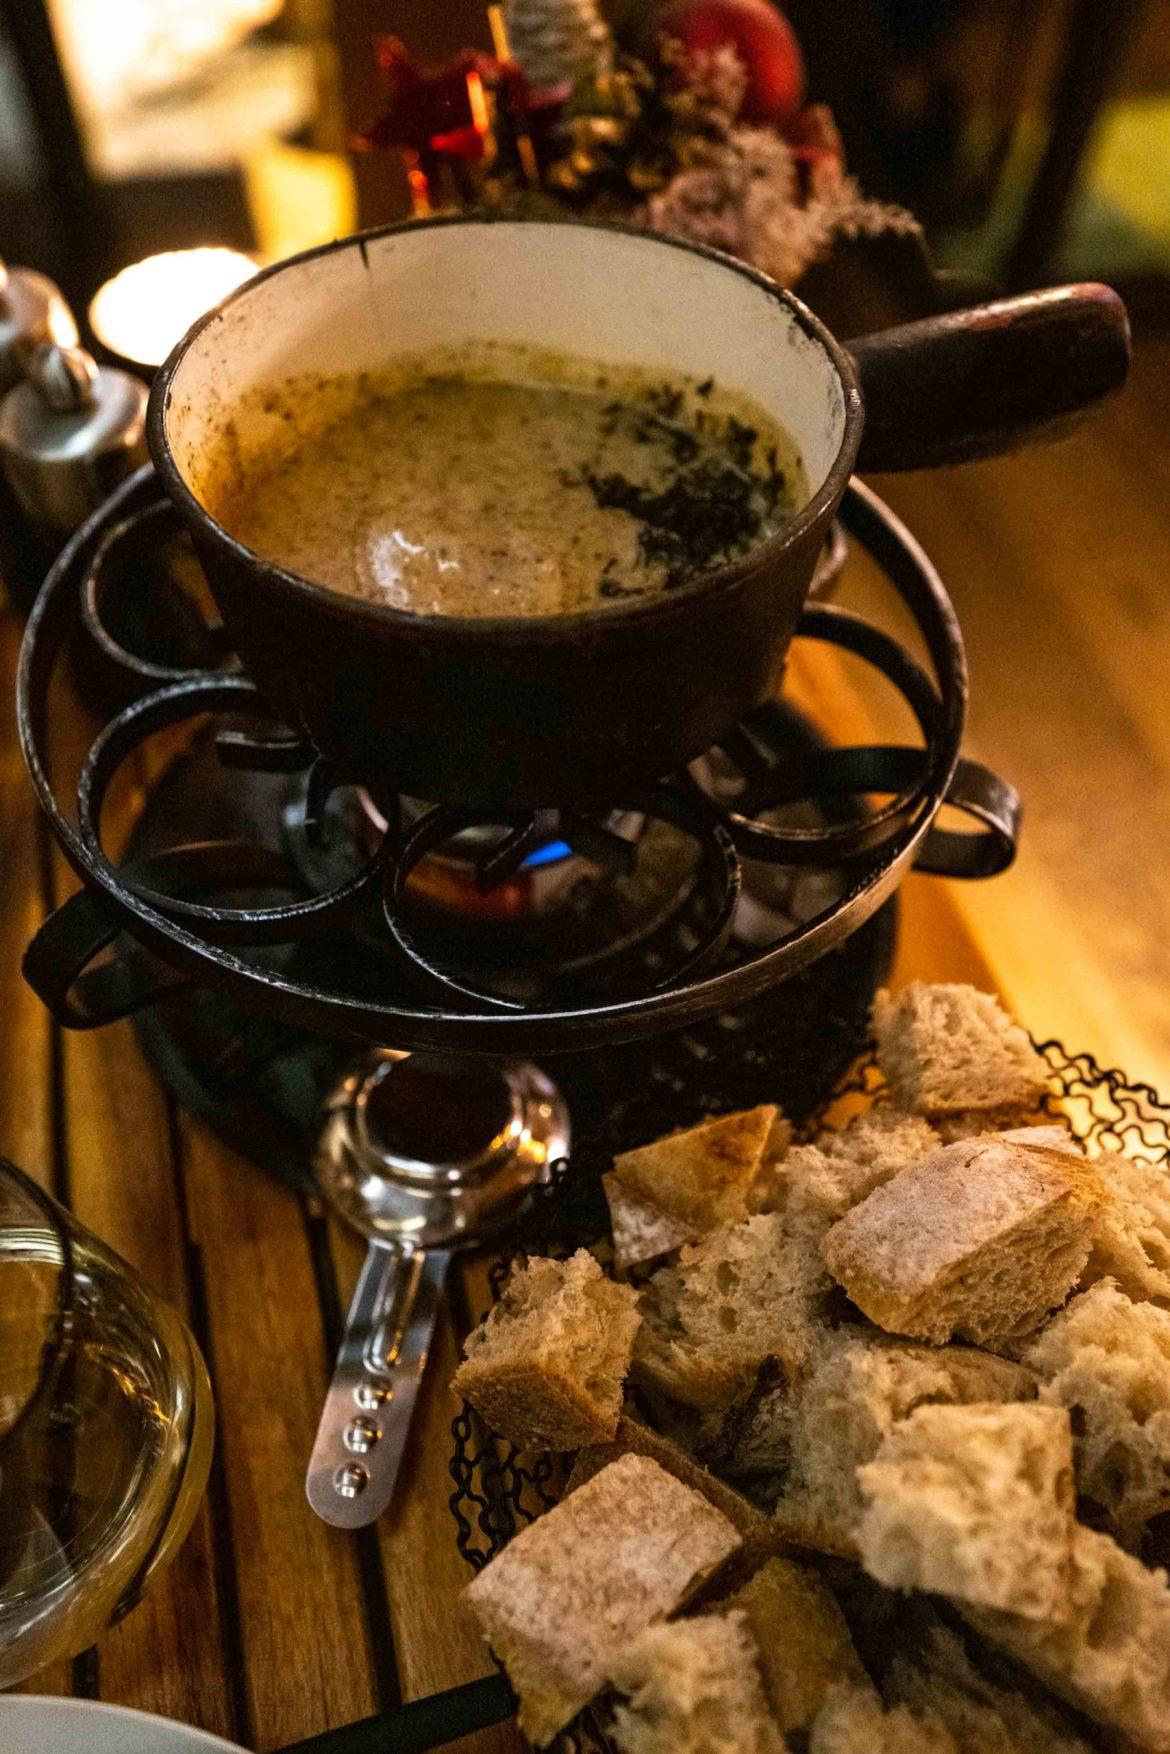 Truffle fondue at Le Carnotzet restaurant at the Crans Ambassador Hotel in Crans Montana, Switzerland. By The Taste Edit #fondue #hotel